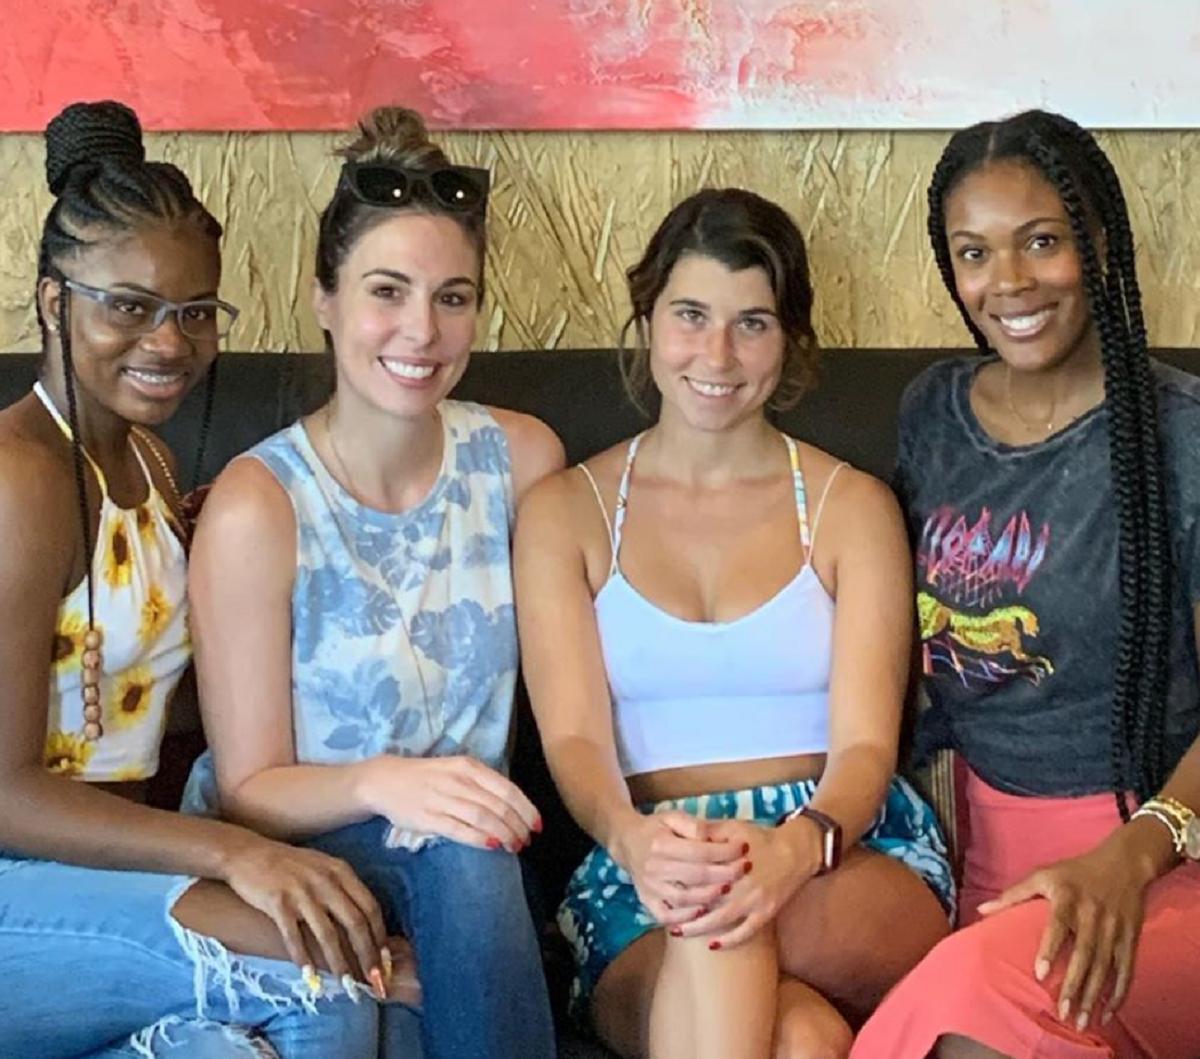 Meka Jones, Mindy Shiben, Amber Bowles, and Iris Caldwell